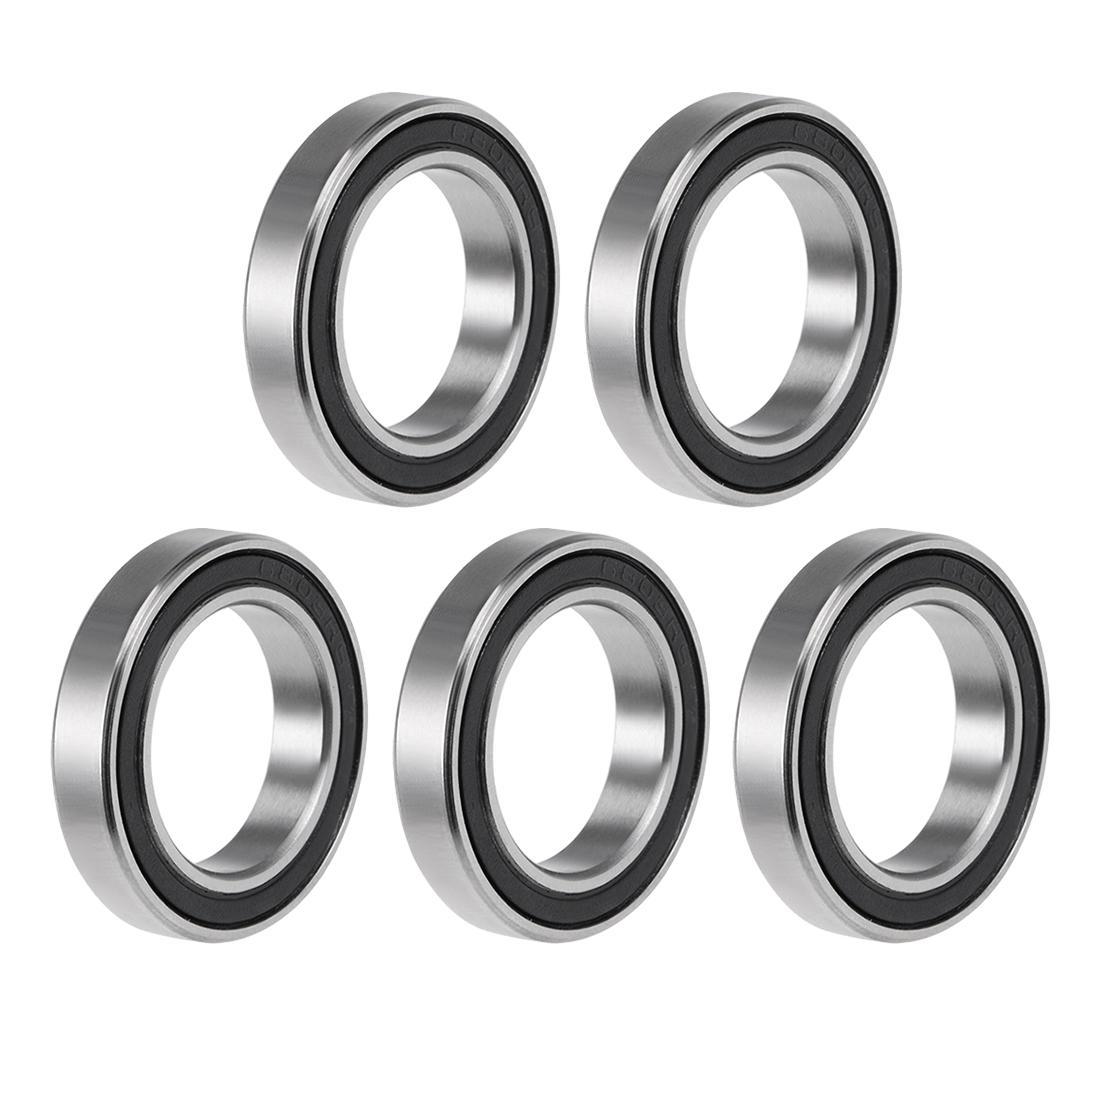 6803-2RS Ball Bearing 17x26x5mm Double Sealed ABEC-3 Bearings 5pcs